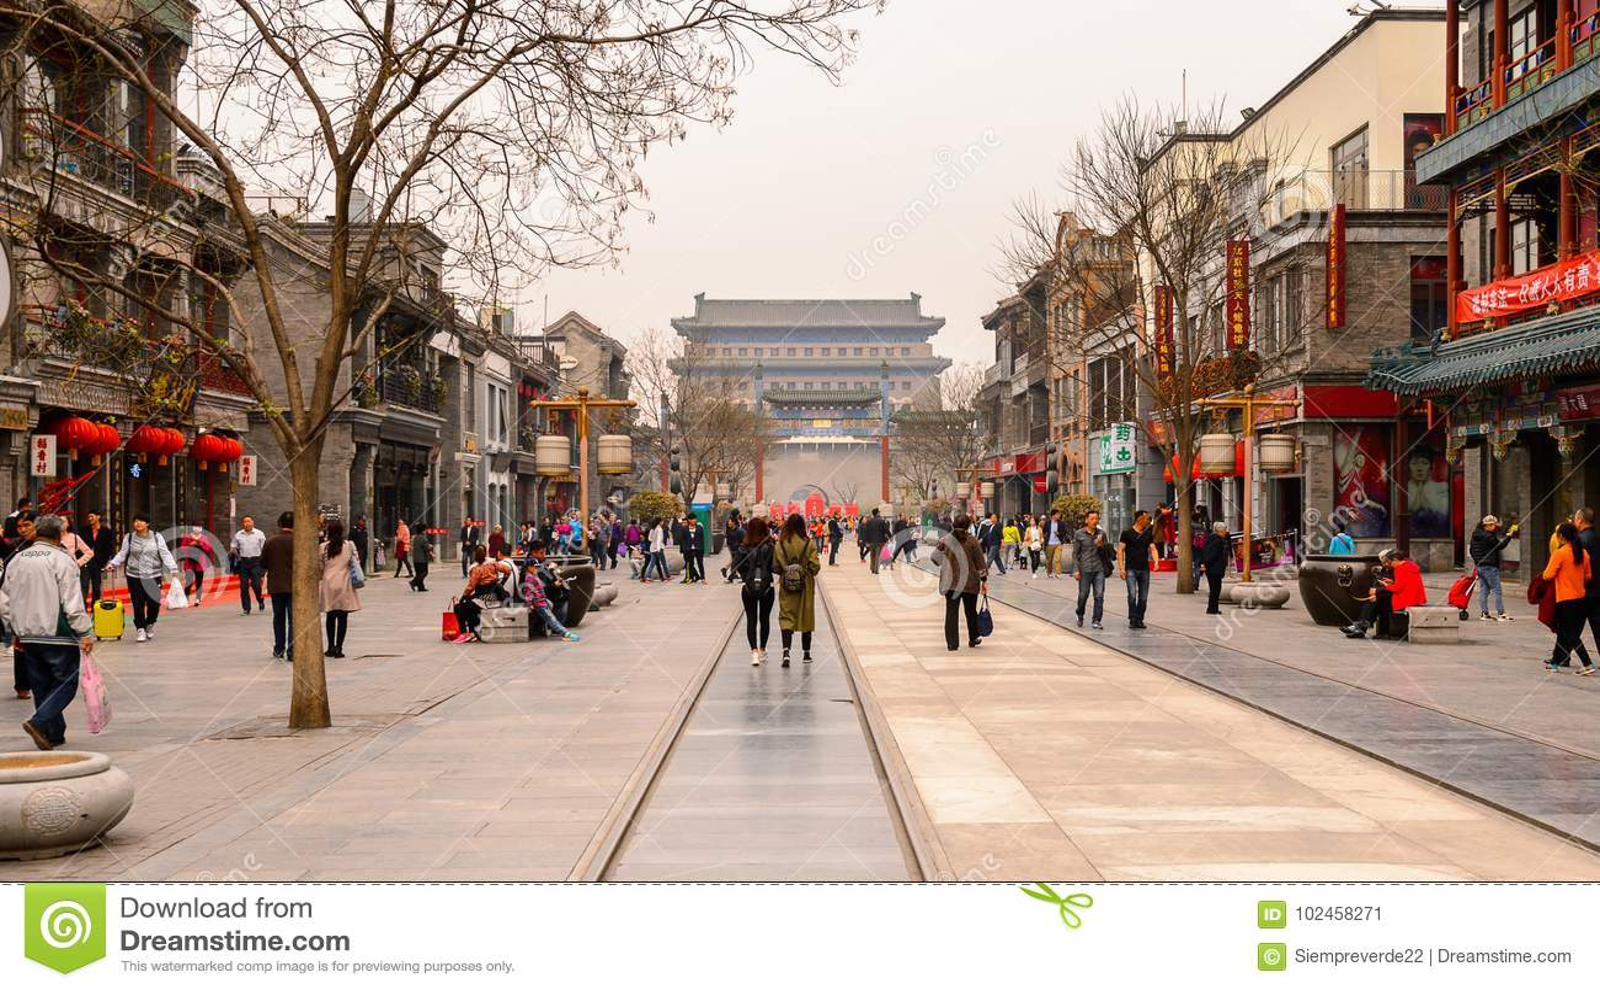 Architecture of Beijing, China